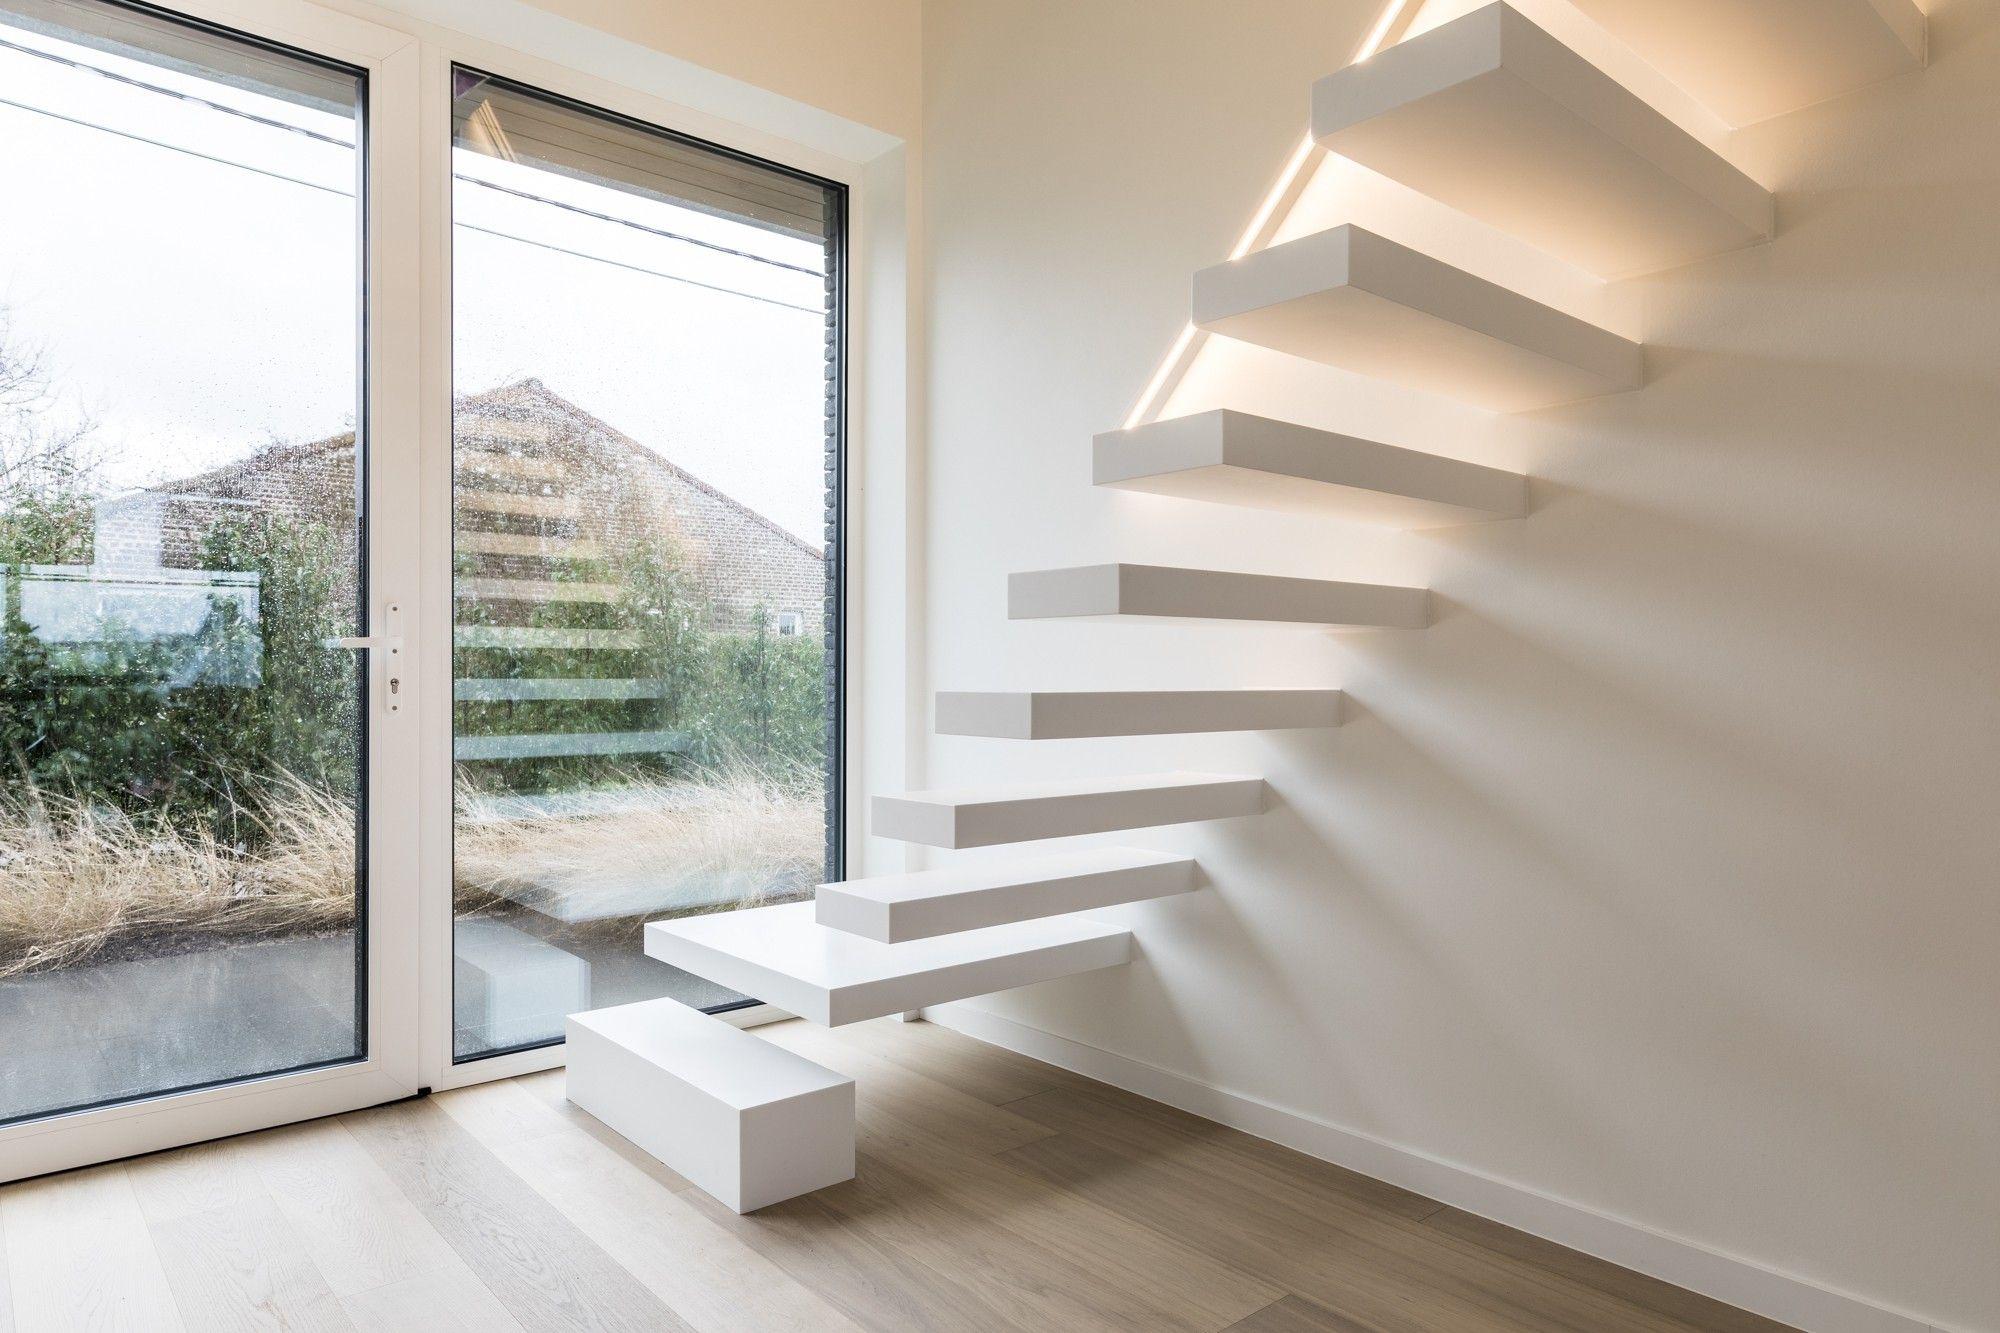 Prijs Zwevende Trap : De wallclimber white is een witte zwevende trap constructie van